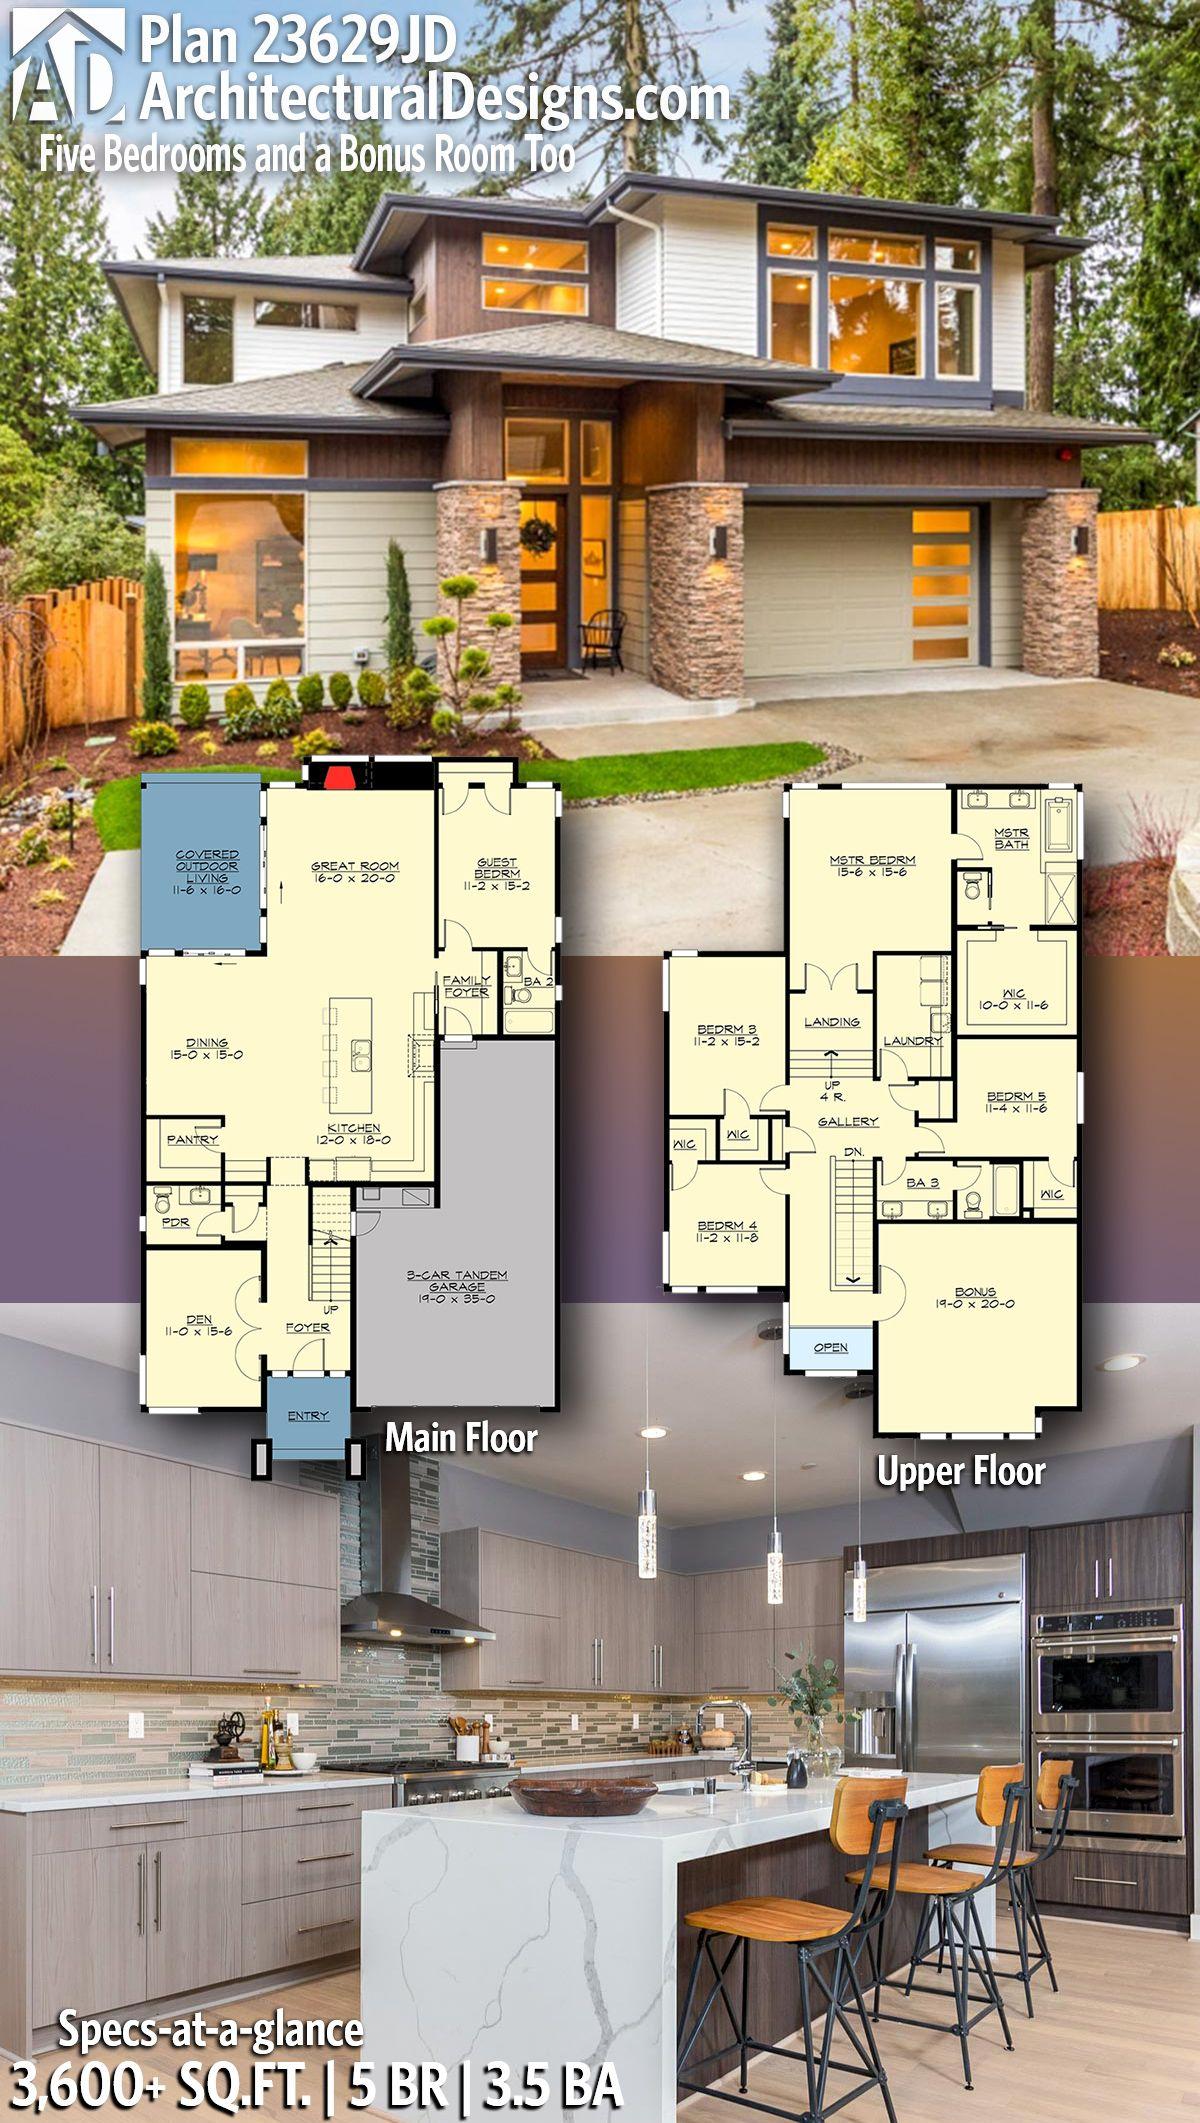 Plan 23629jd Five Bedrooms And A Bonus Room Too Architectural Design House Plans Modern House Plans Modern House Design